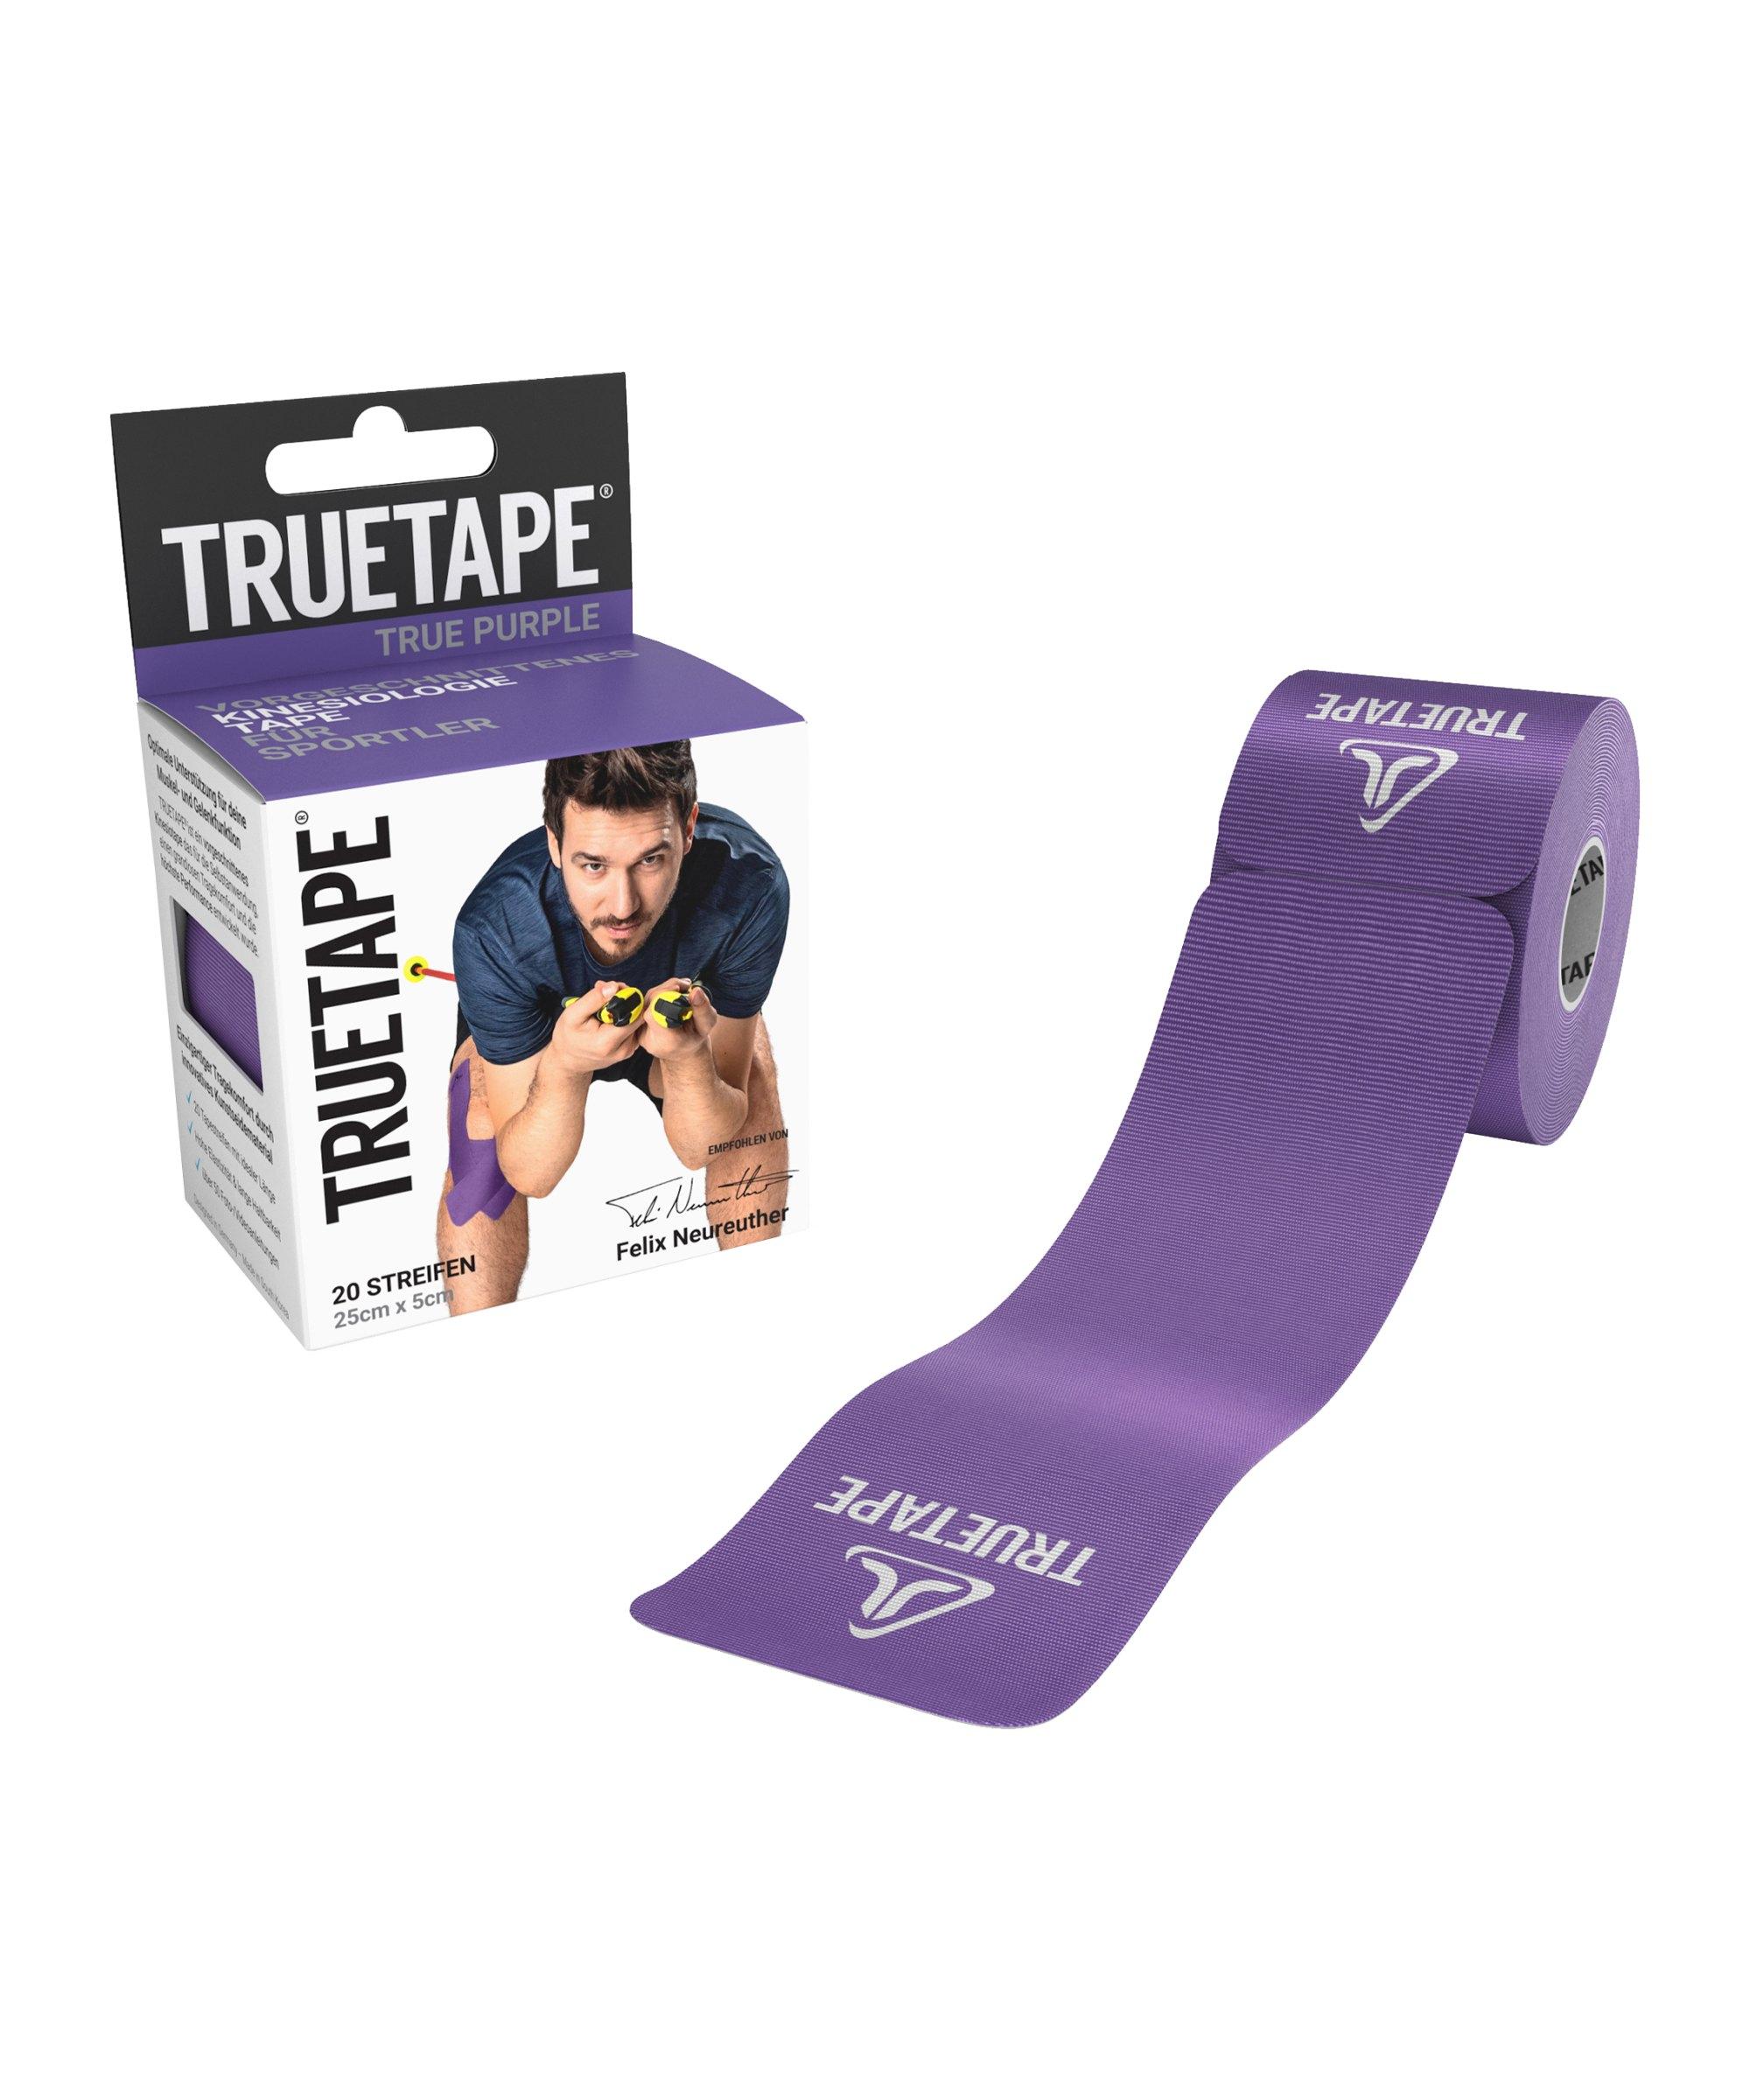 Truetape Athlete Edition True Tape Lila - lila